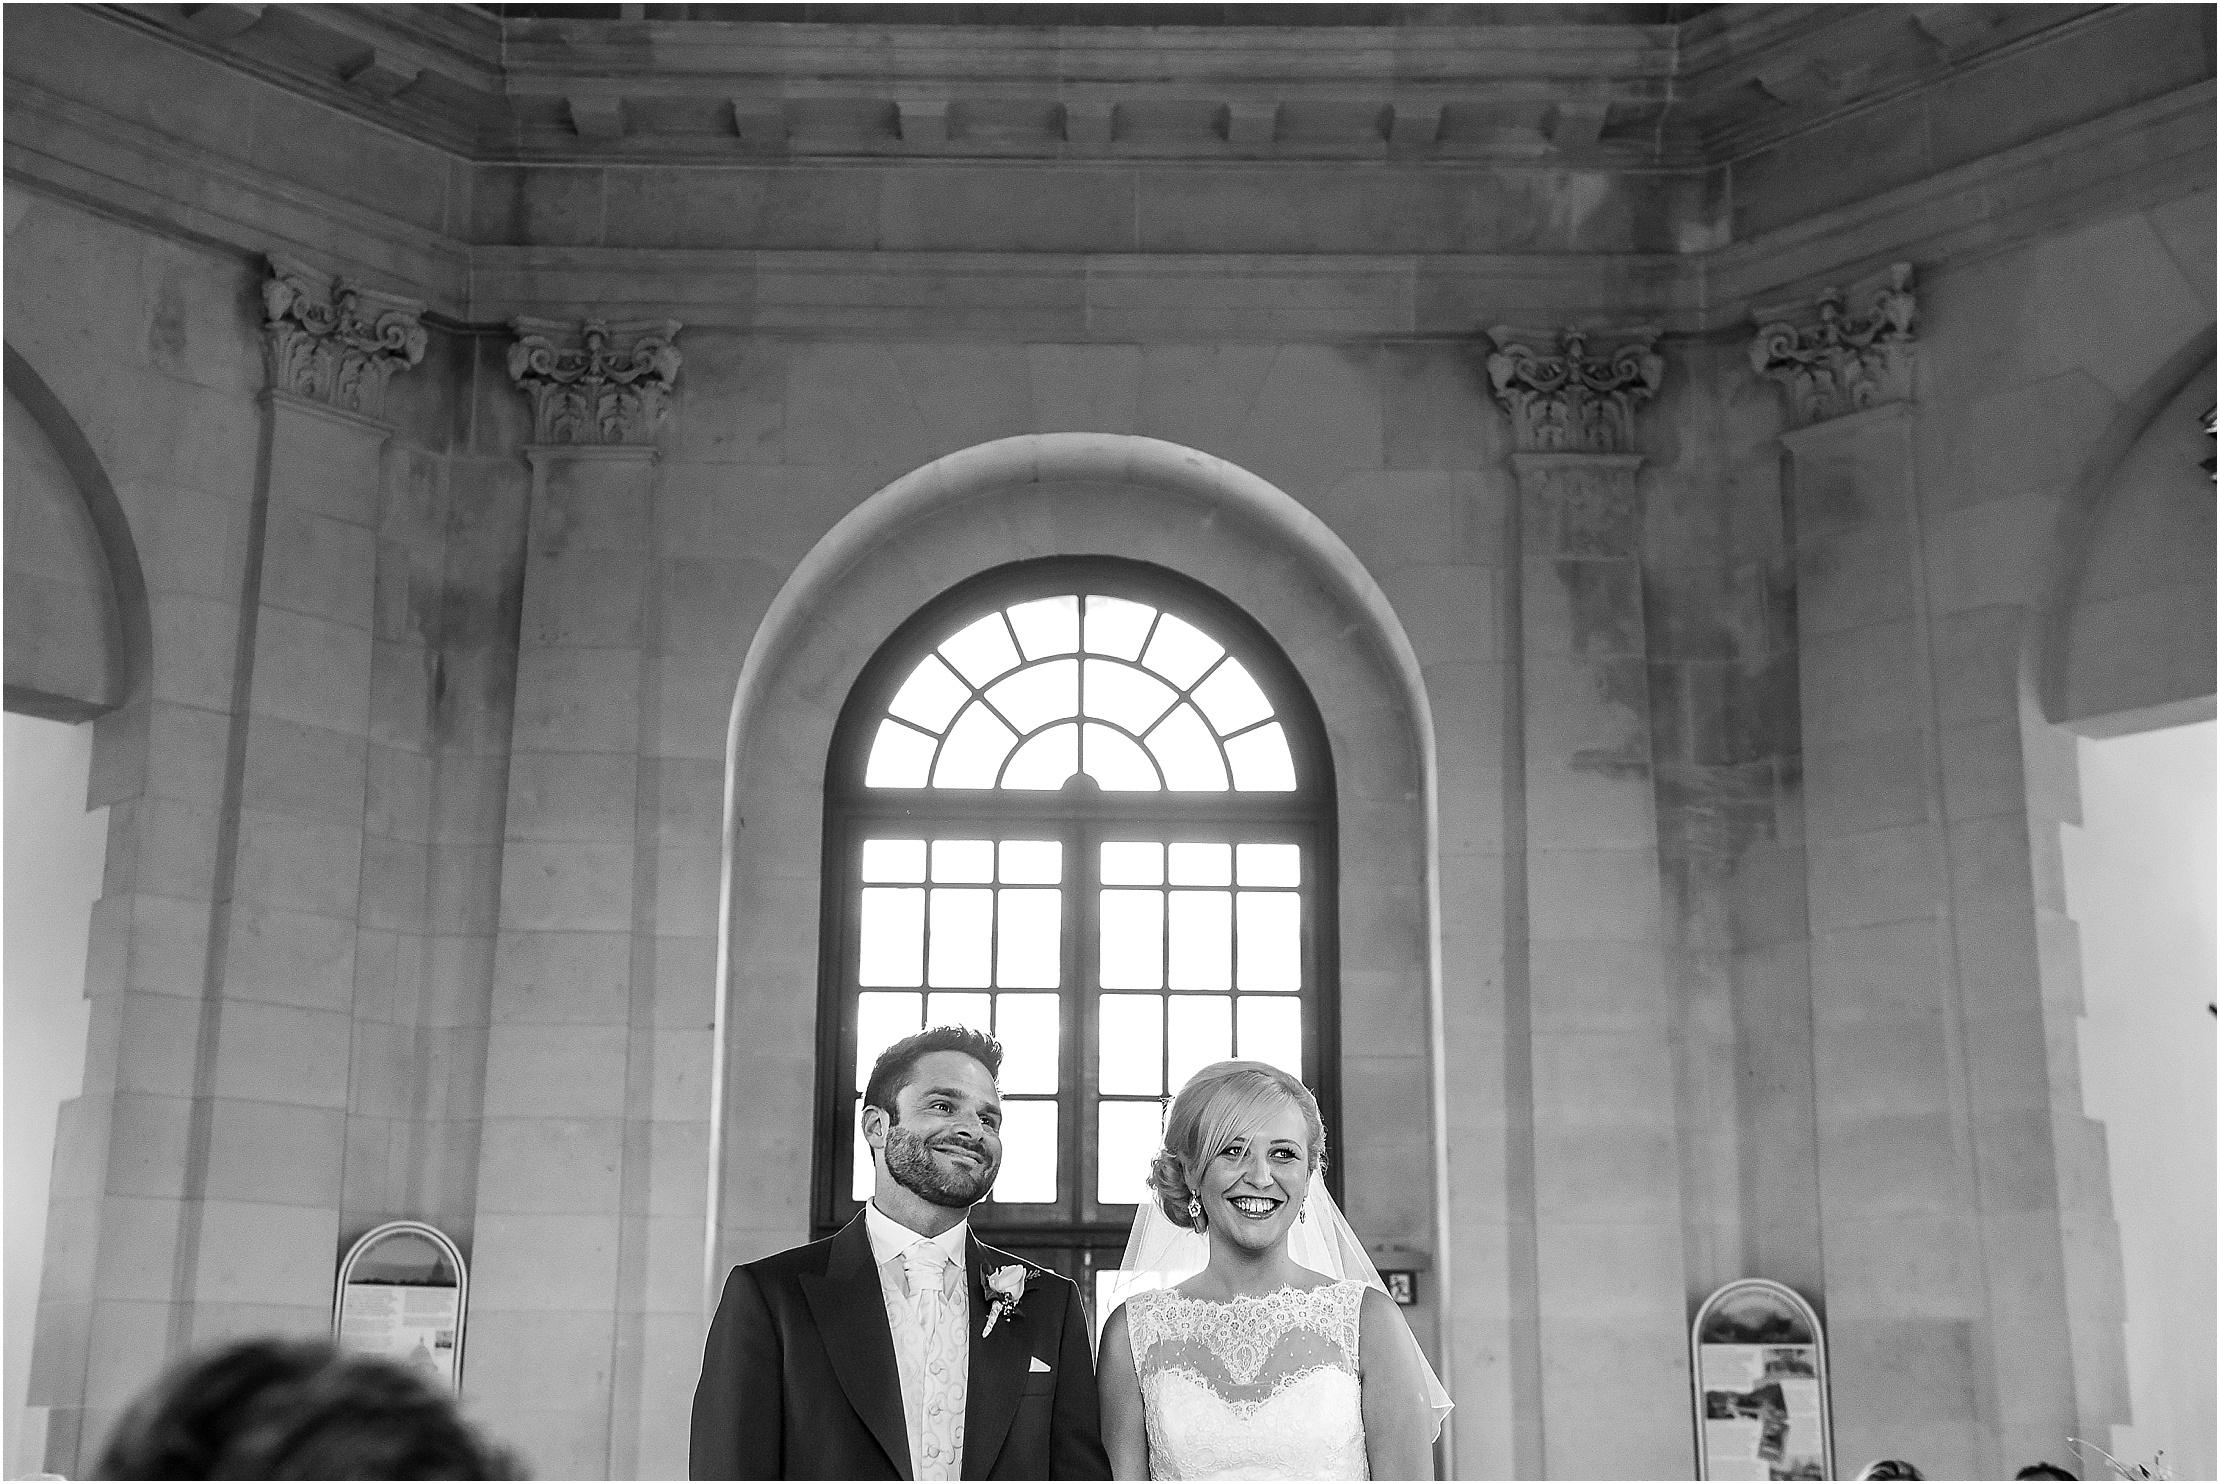 staining-lodge-wedding-067.jpg